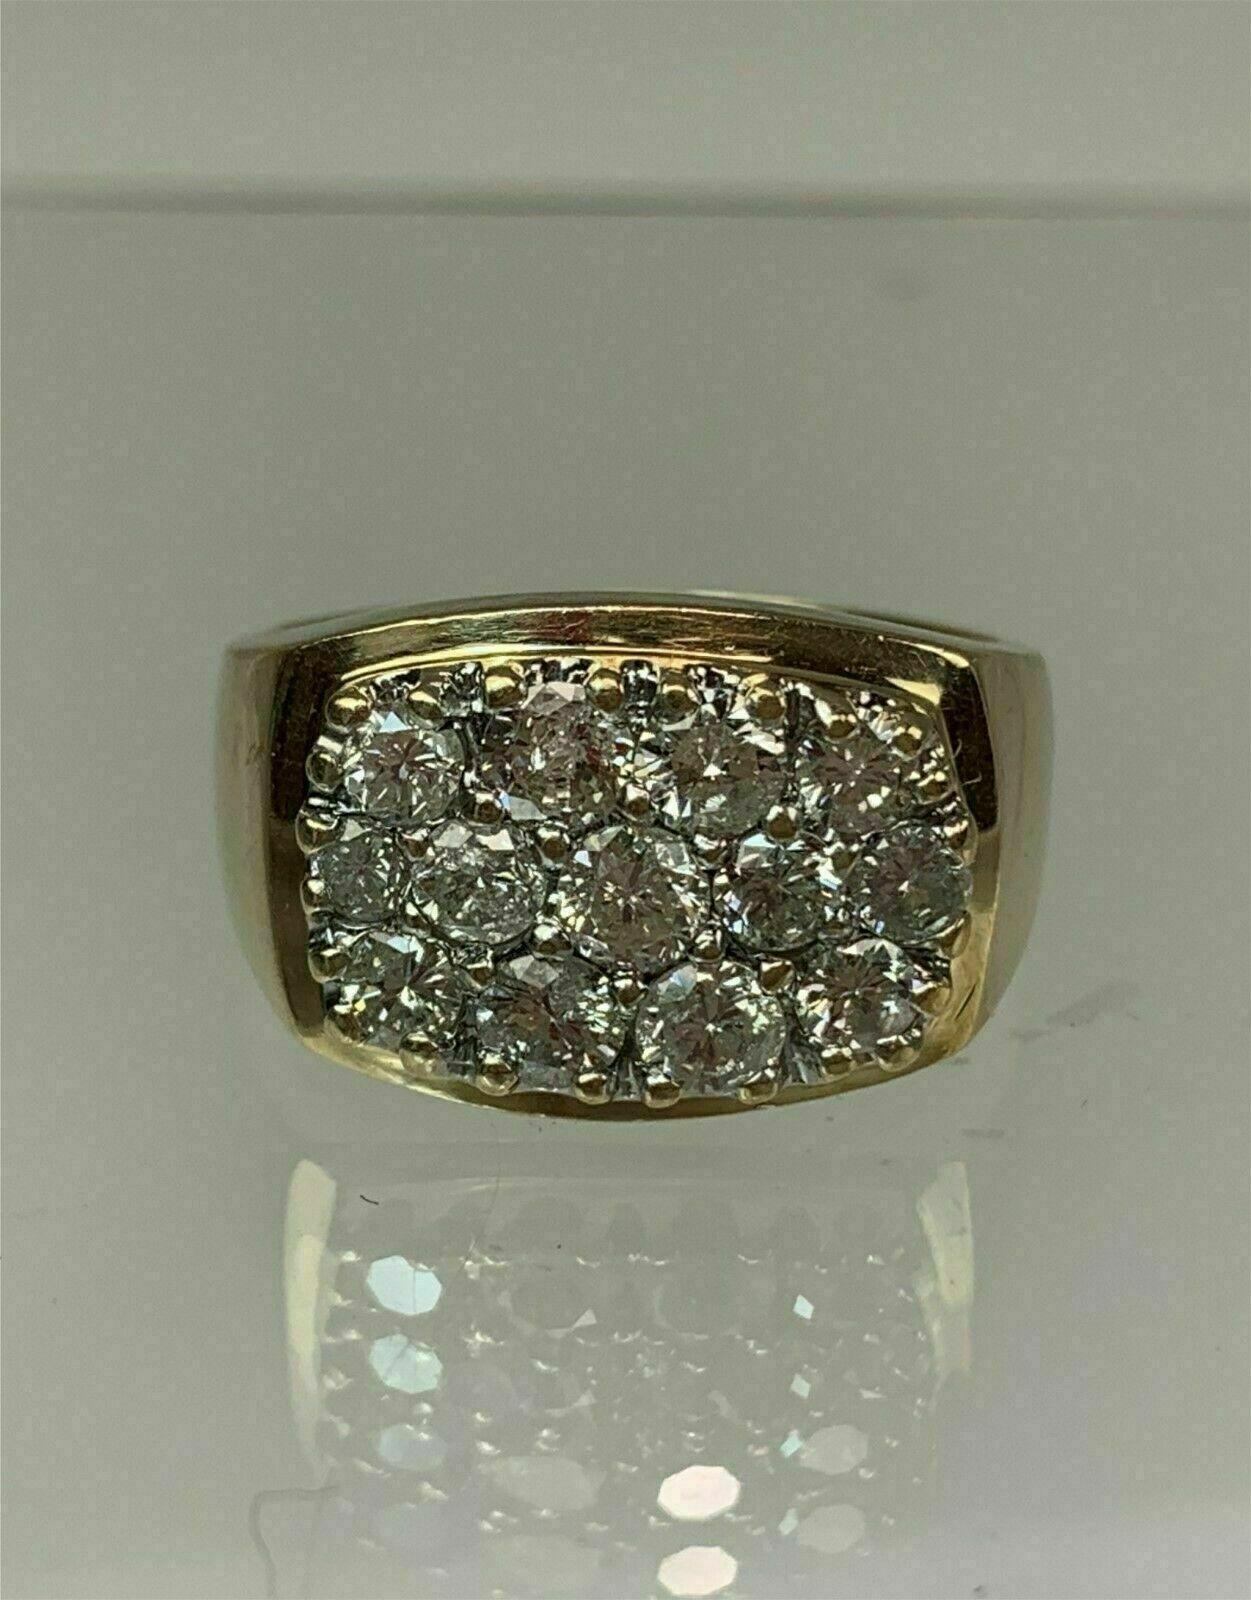 1.50 Ct Round Cut Diamond Gent's Men's Wedding Band Ring 14k Yellow Gold Over 1